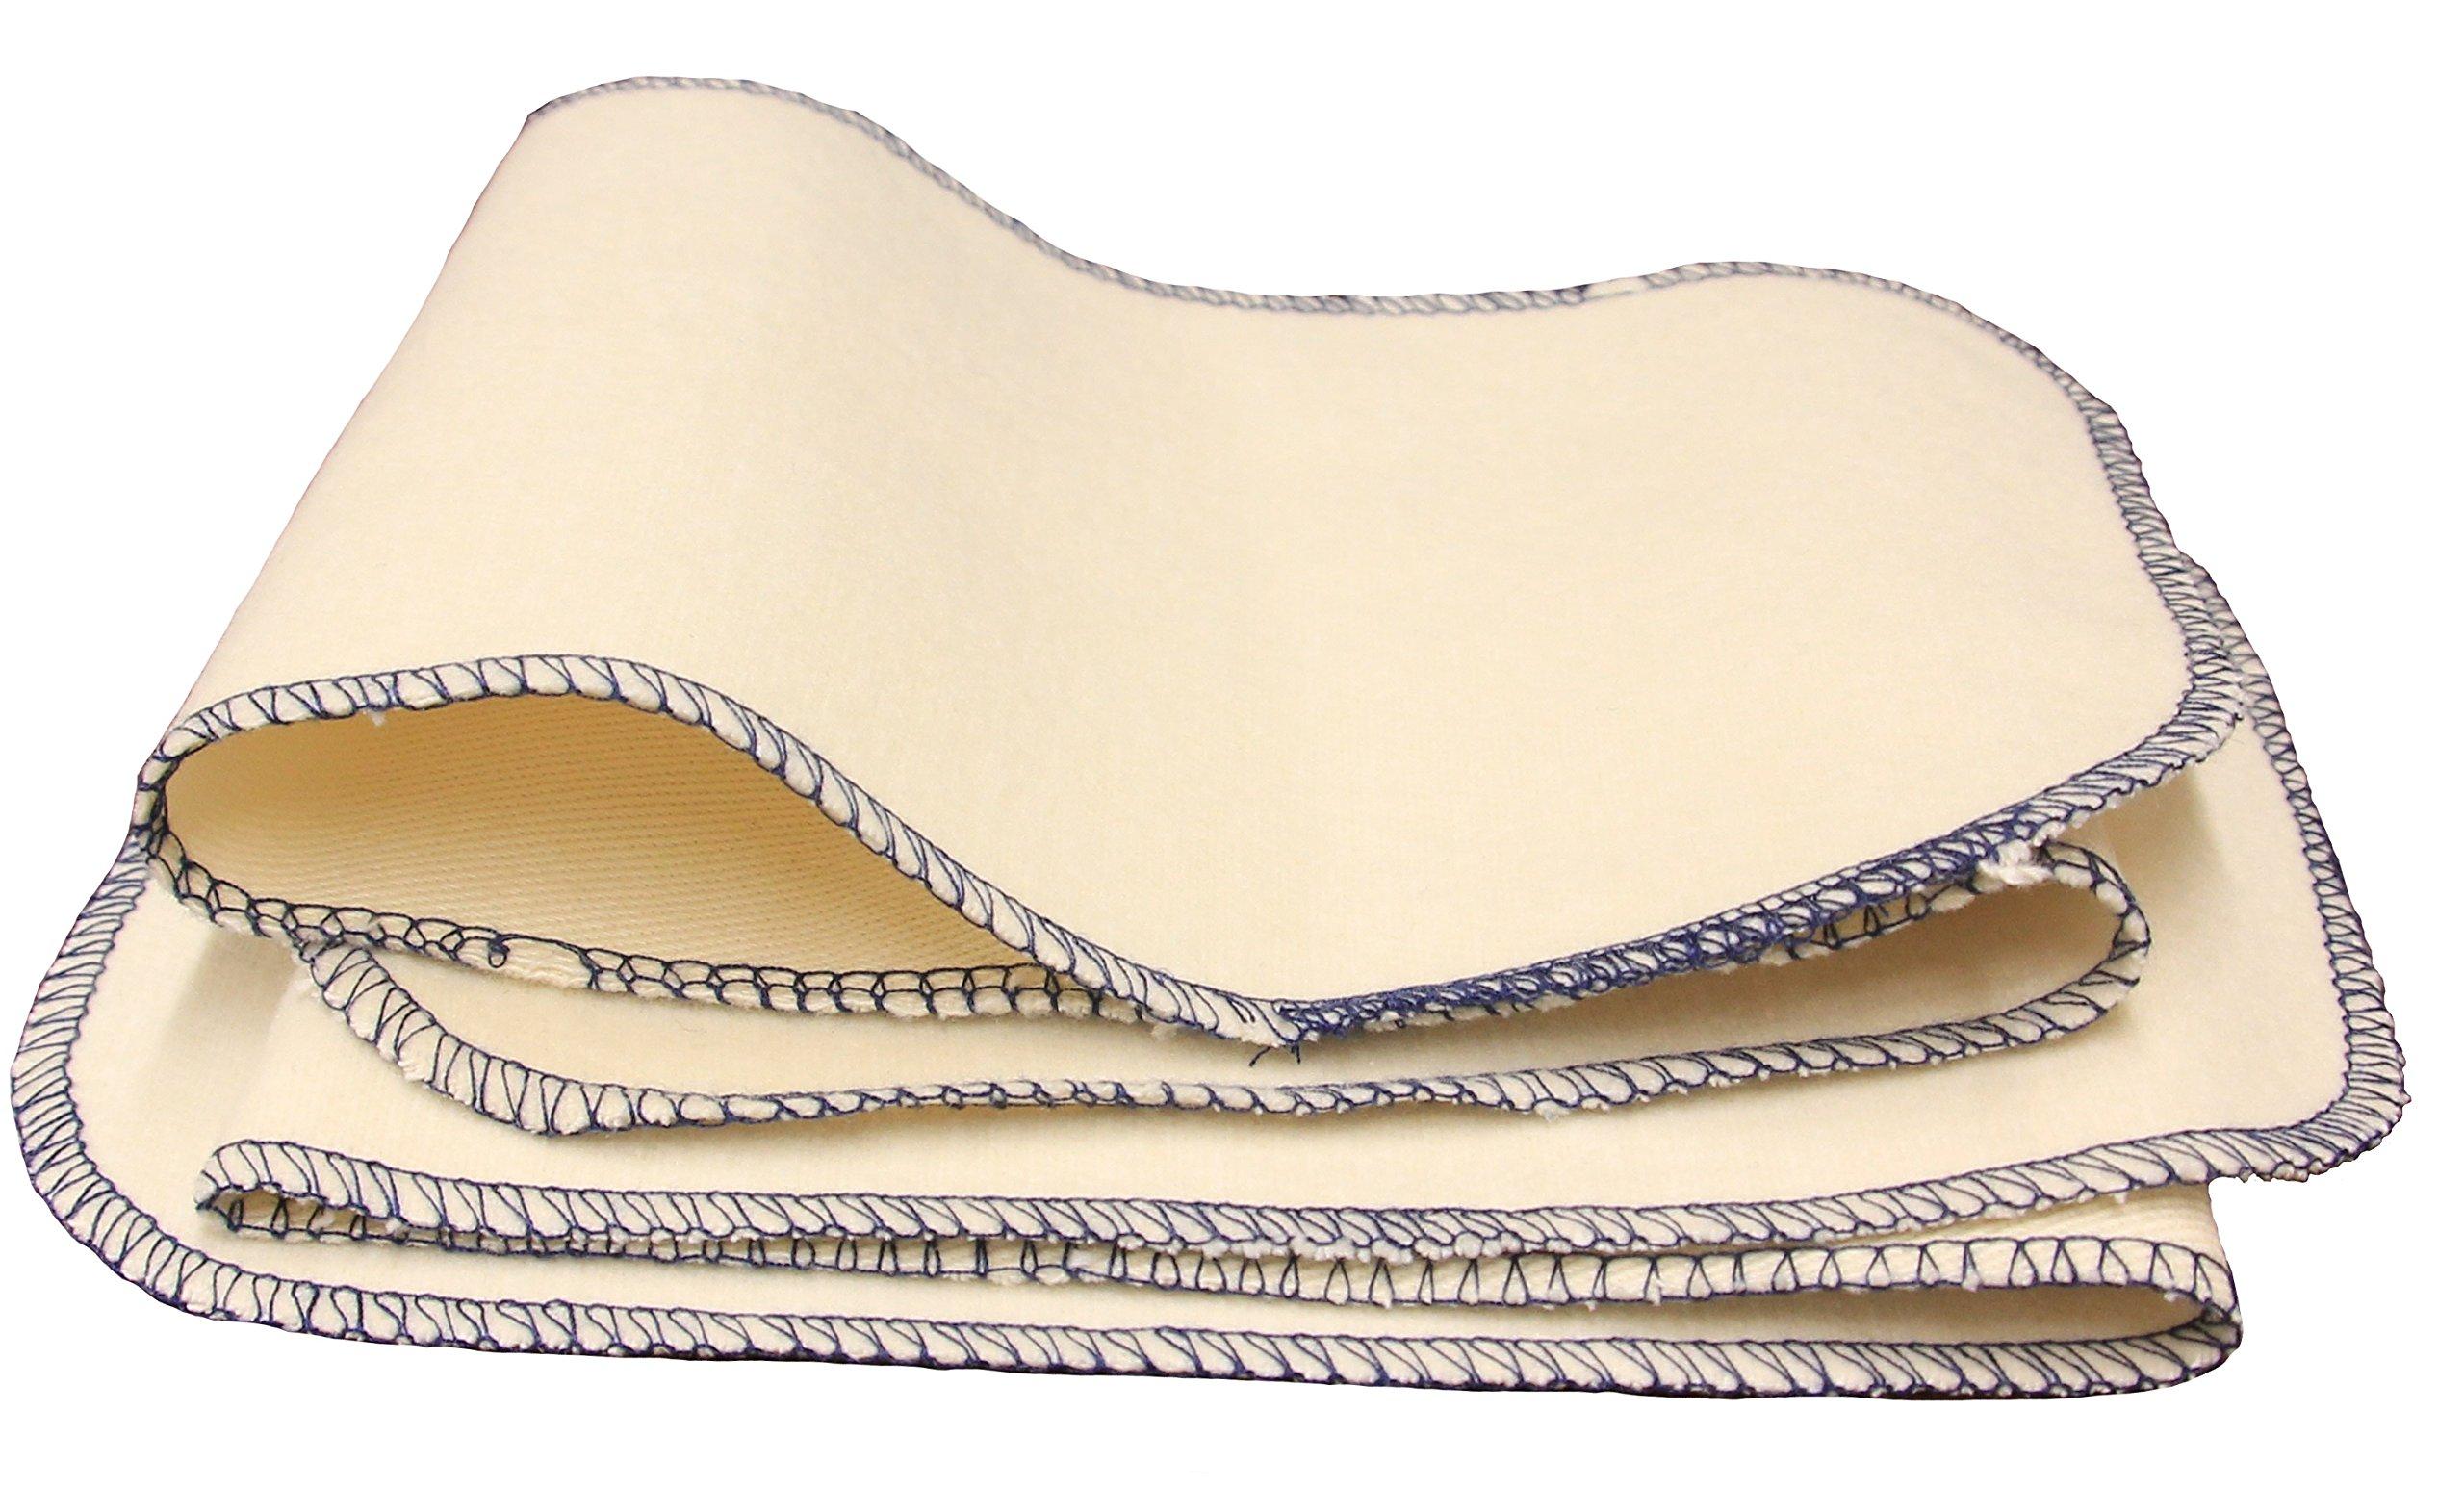 FeetPeople Premium Professional Shine Cloth, 20 Inch x 5 Inch, 6 Cloths